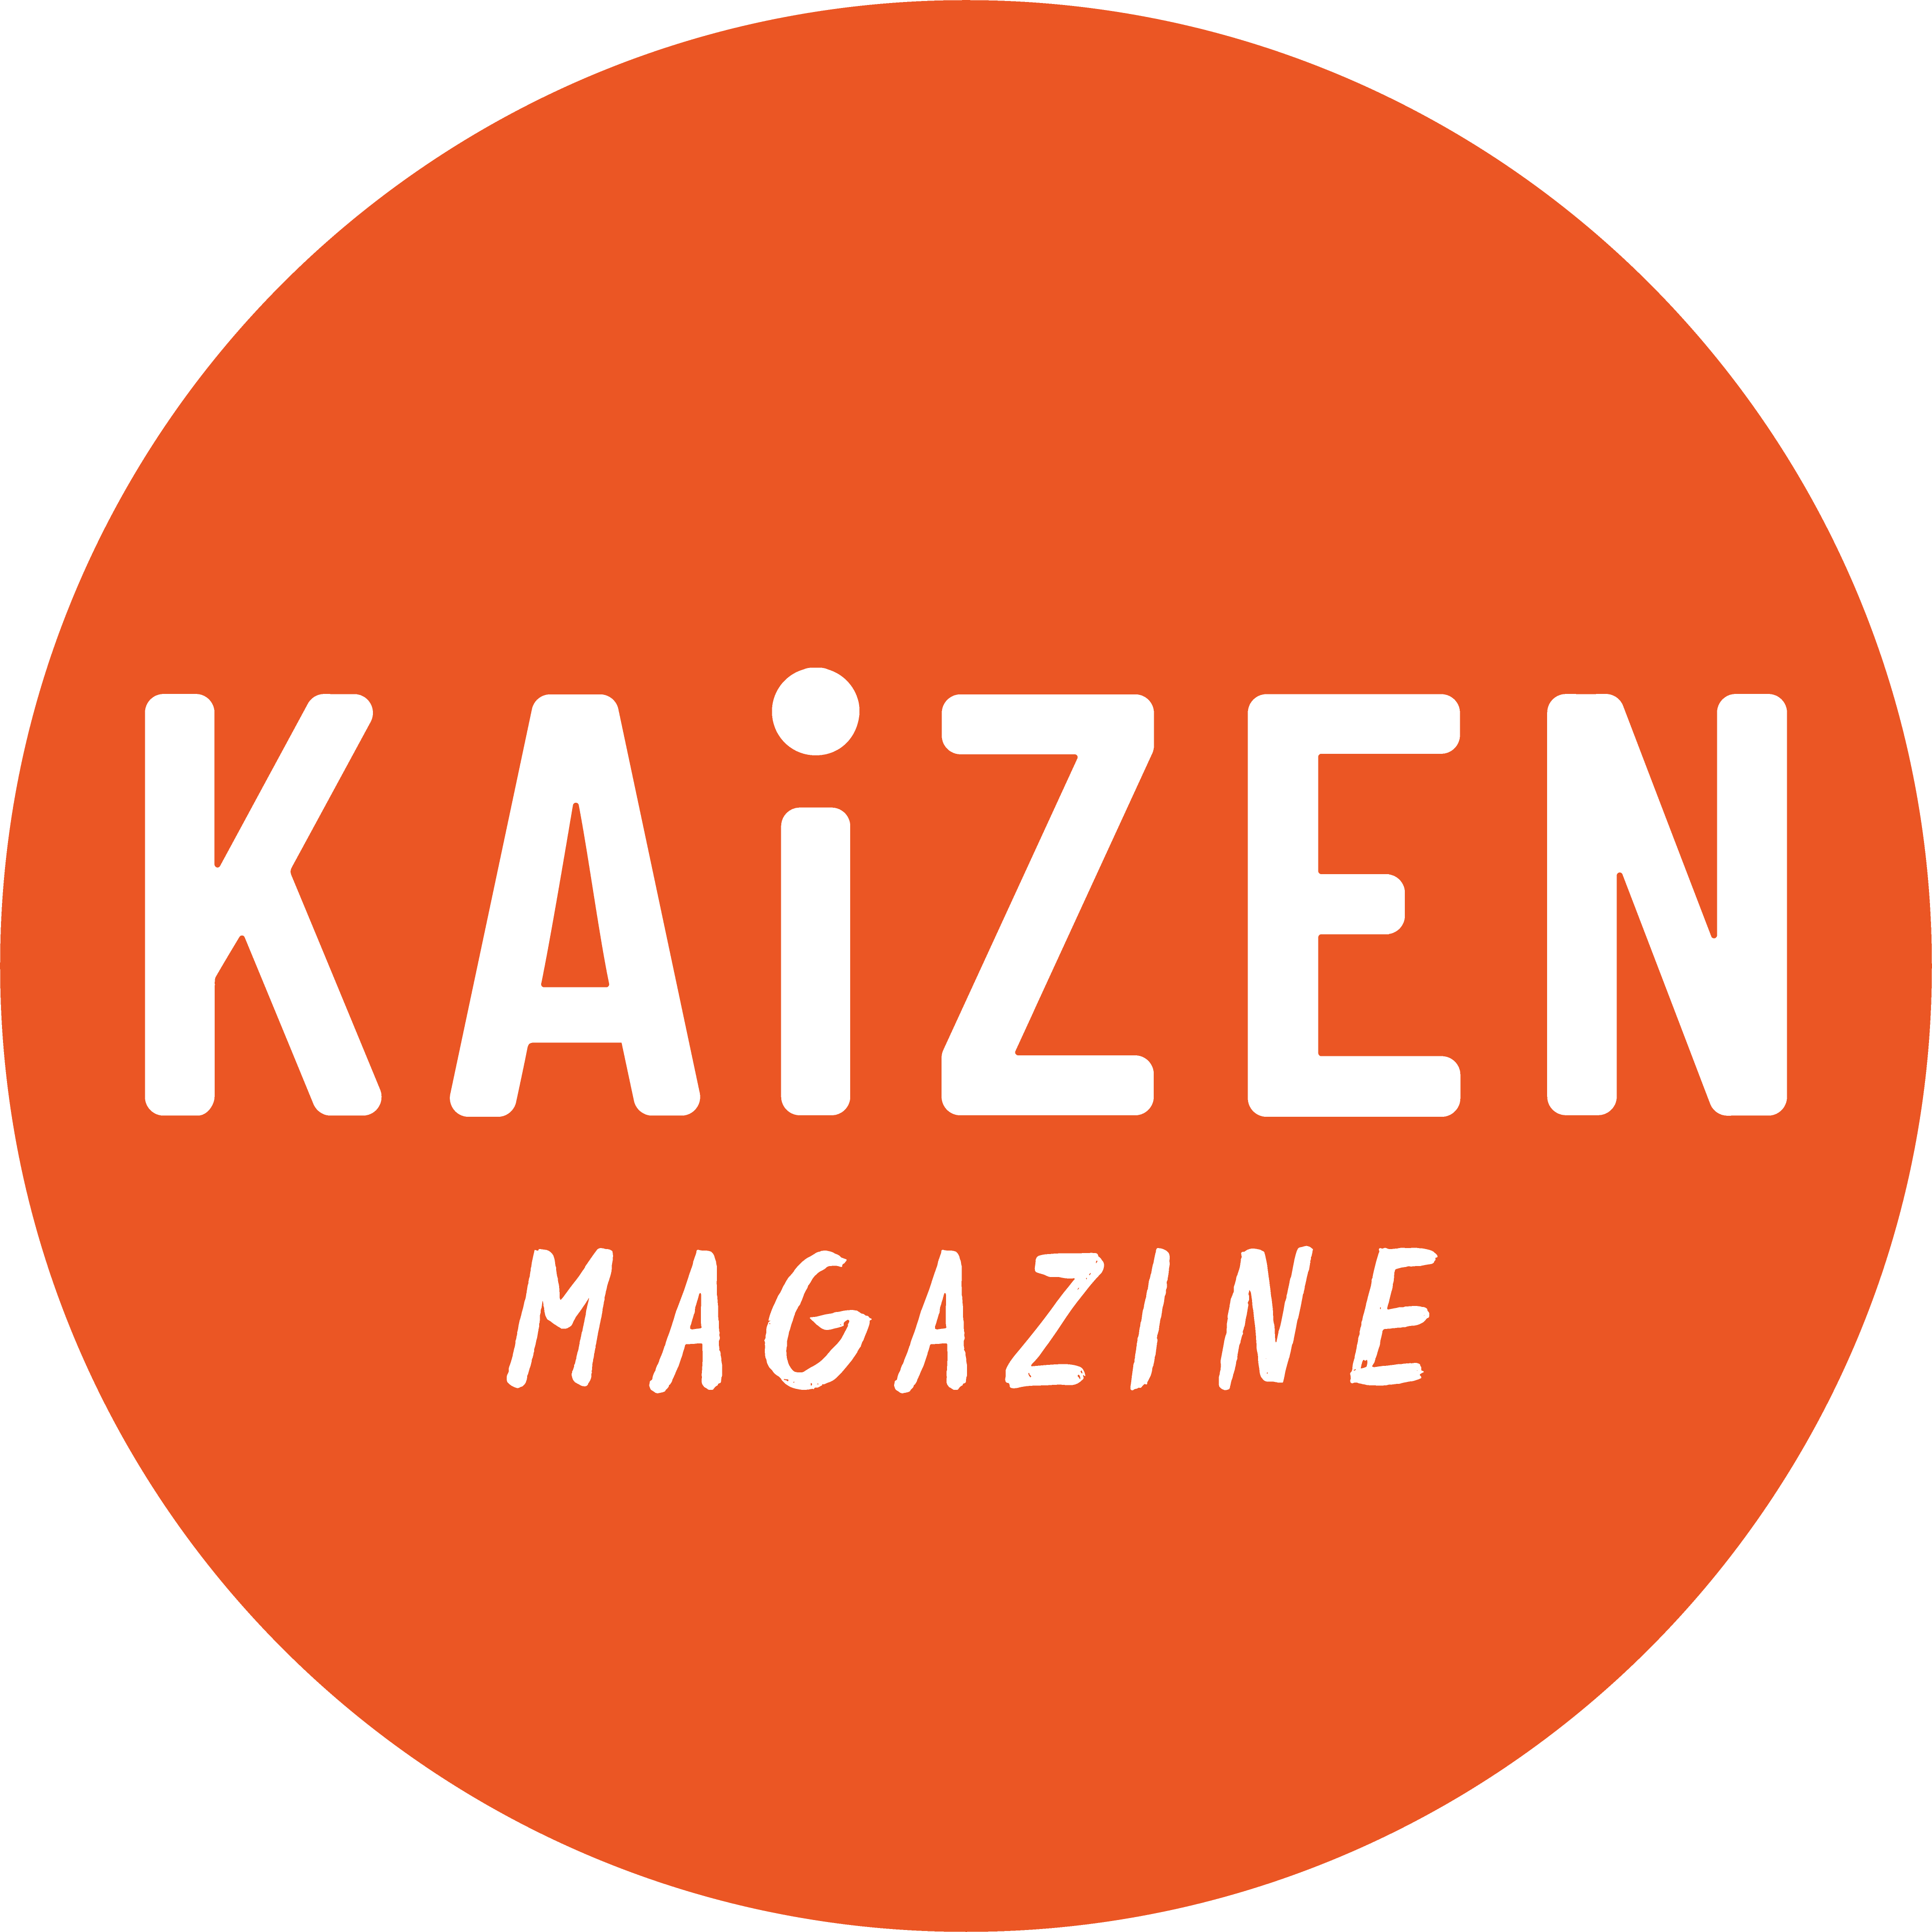 https://kaizen-magazine.com/